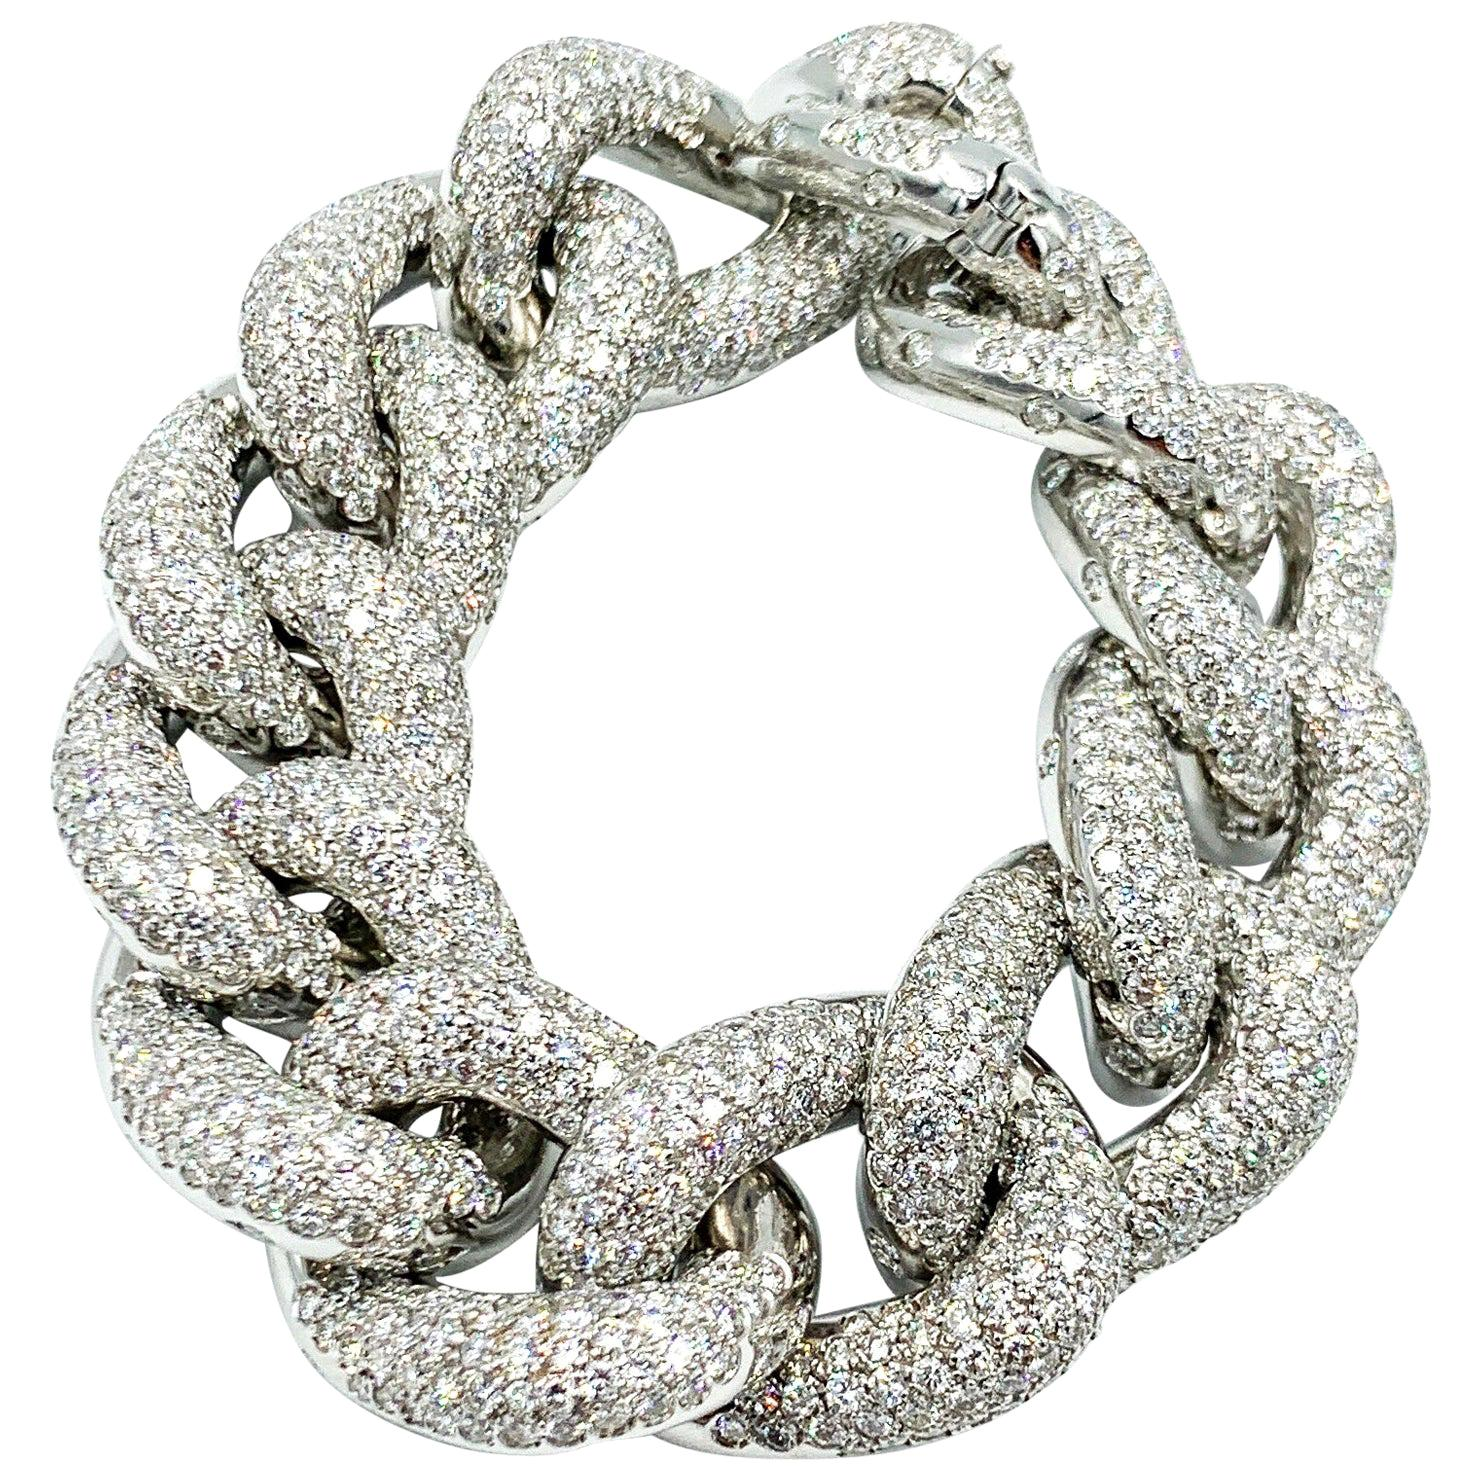 Italian Made 18 Karat White Gold Diamond Bracelet